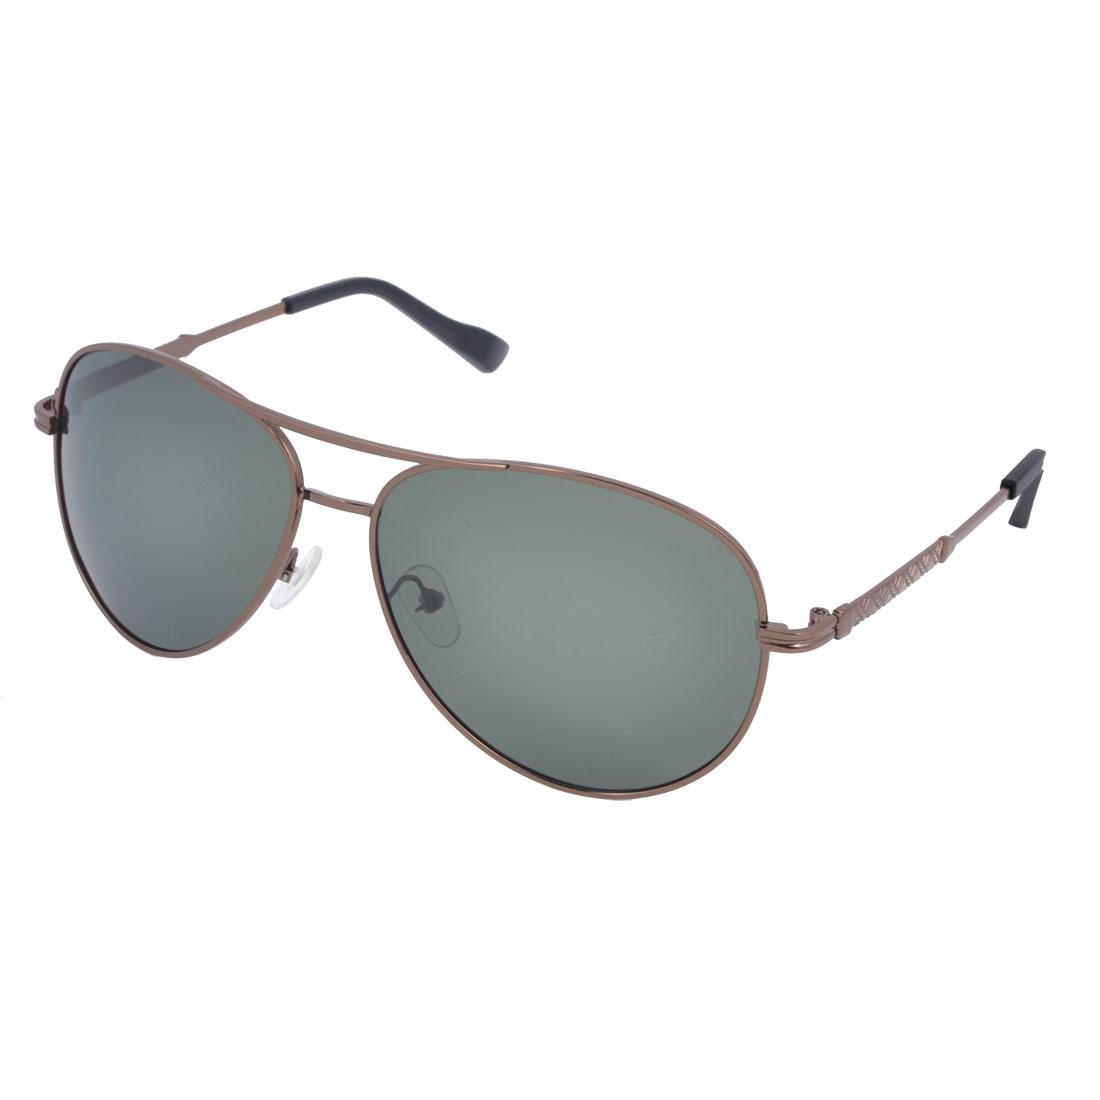 Man Brown Double Bridge Full Rim Gray Green Waterdrop Lens Polarized Sunglasses